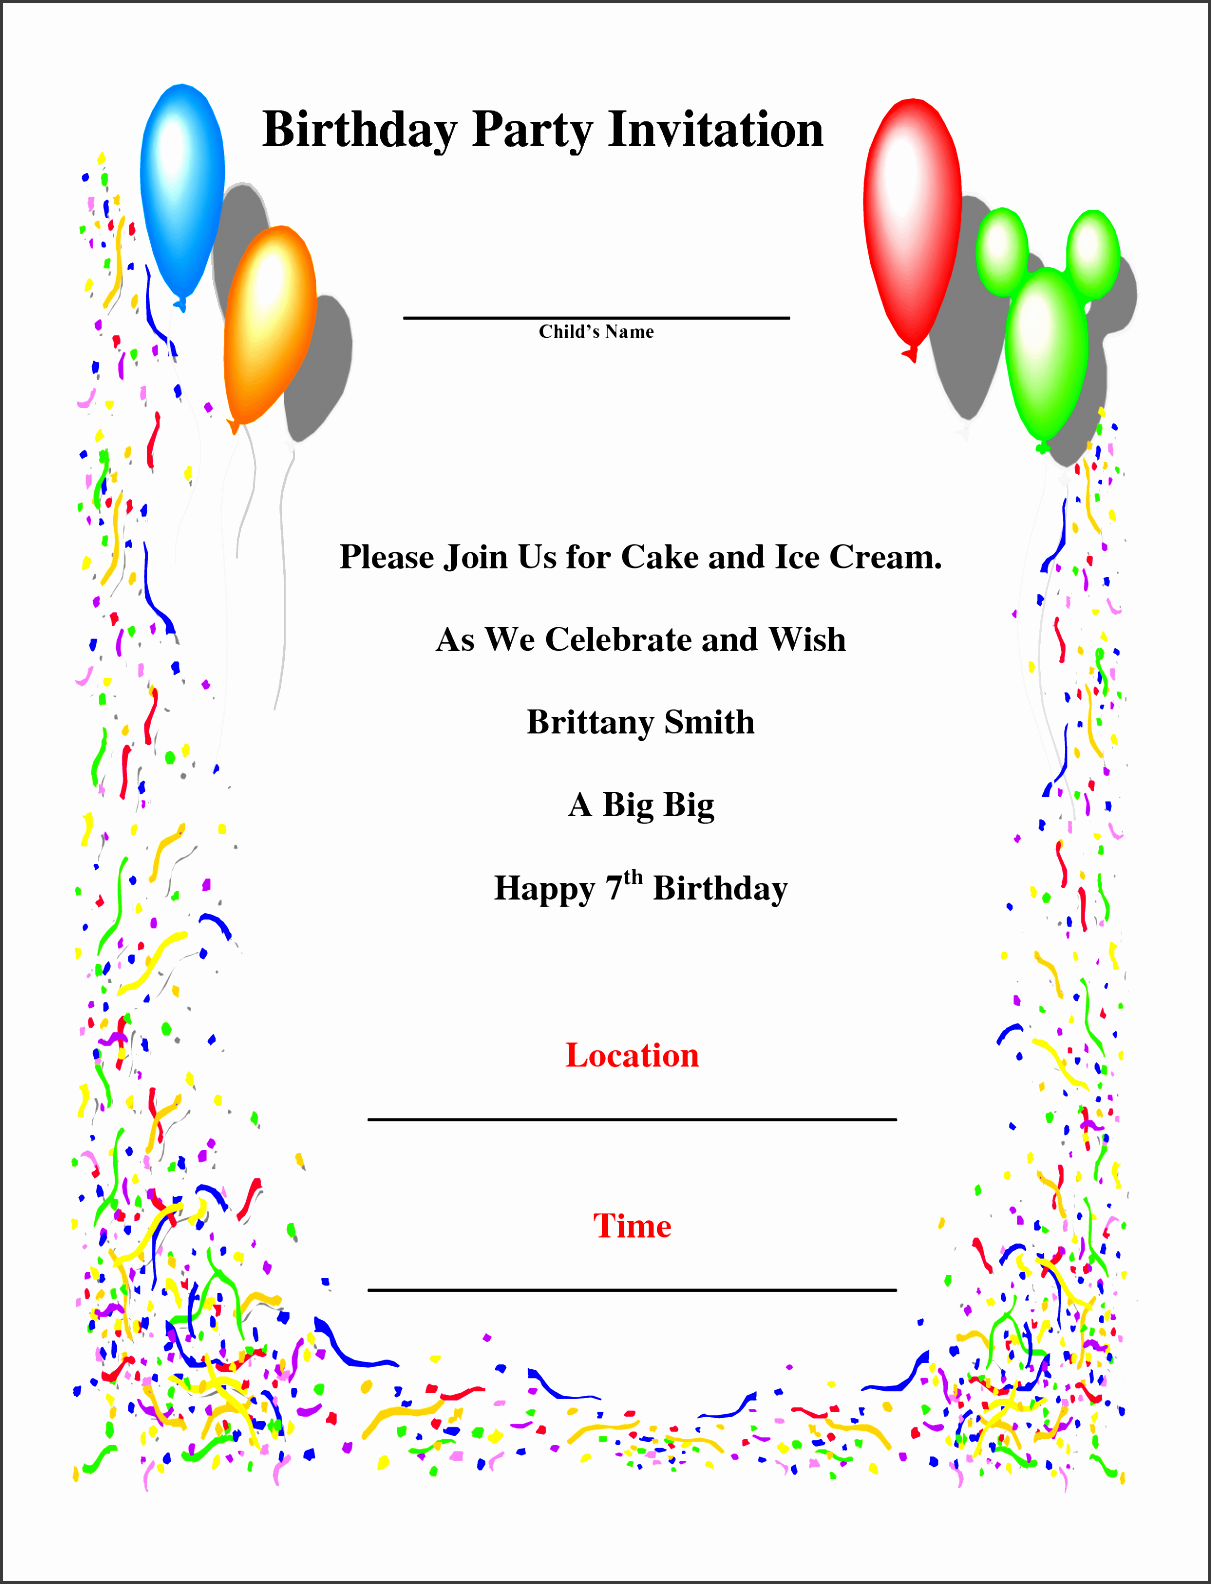 birthday party invite template and the model auà ergewà hnlich colors birthday invitations minimalis ideas 19